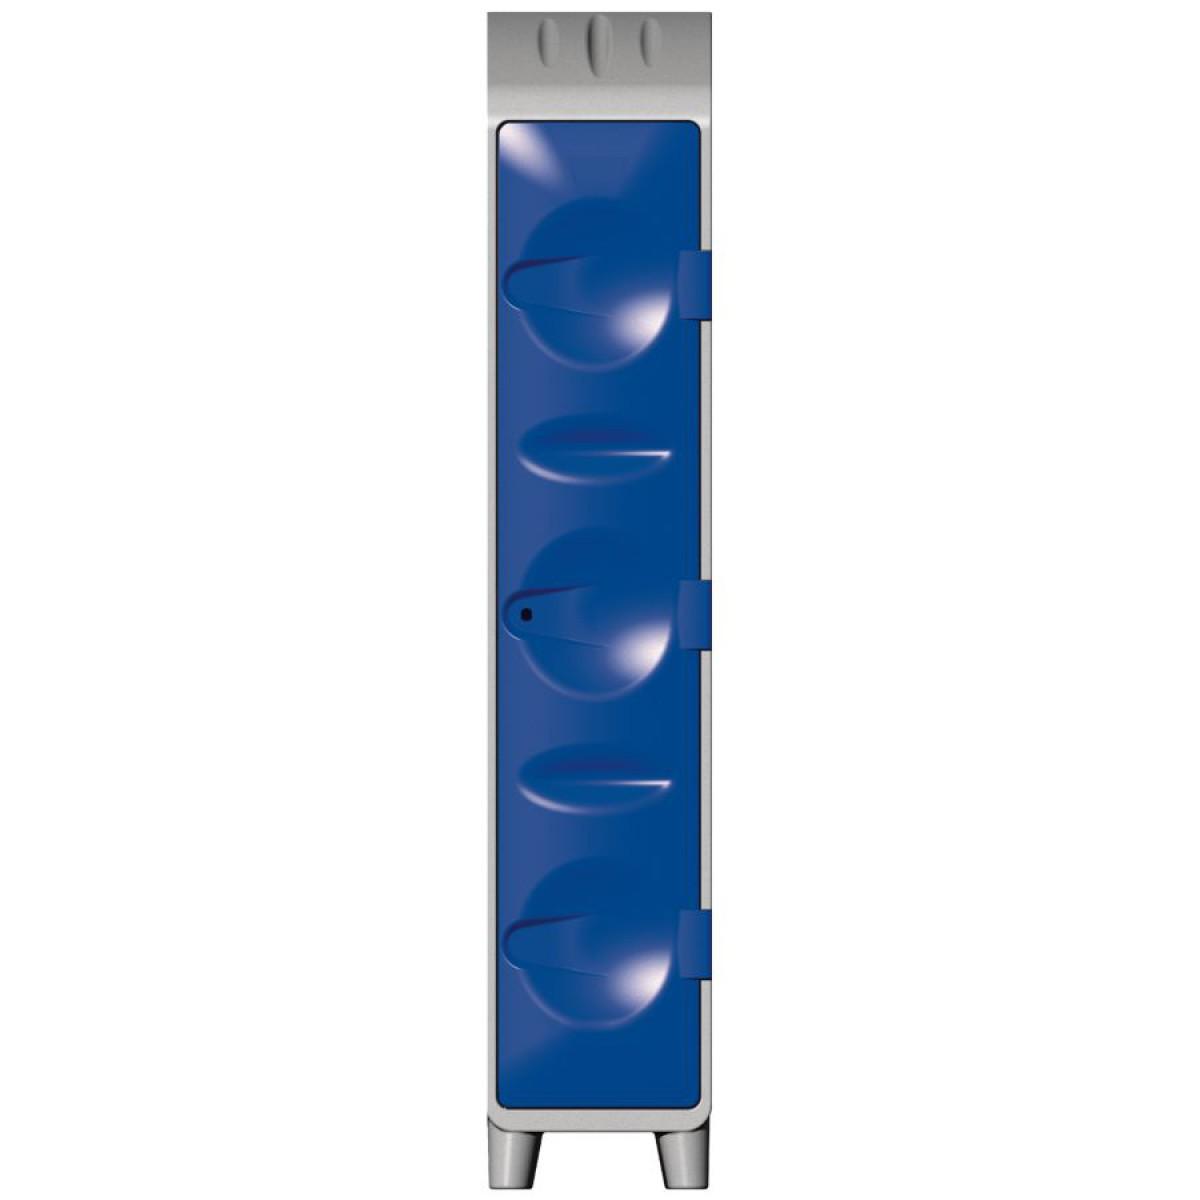 vestiaire poly thyl ne 1 tag re porte cintres avec pieds porte bleue hse center. Black Bedroom Furniture Sets. Home Design Ideas